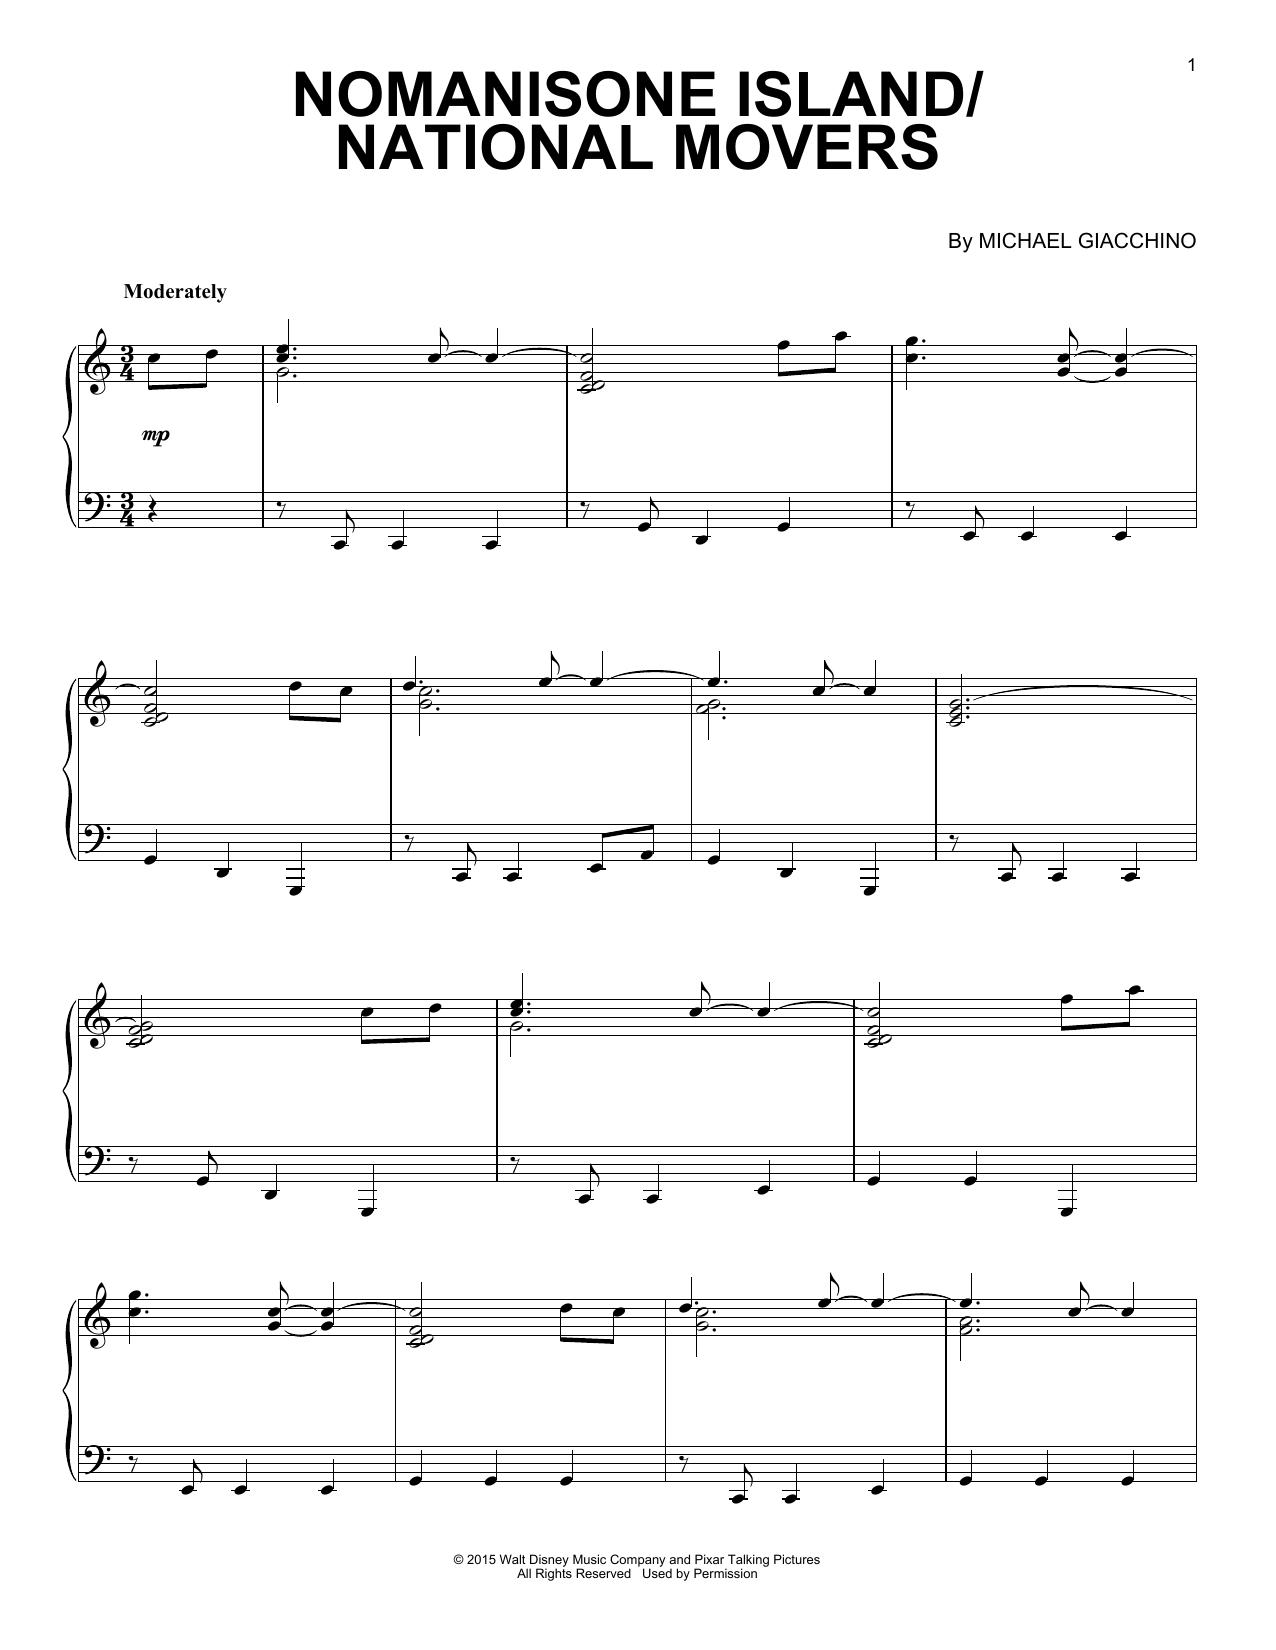 Nomanisone Island/National Movers (Piano Solo)